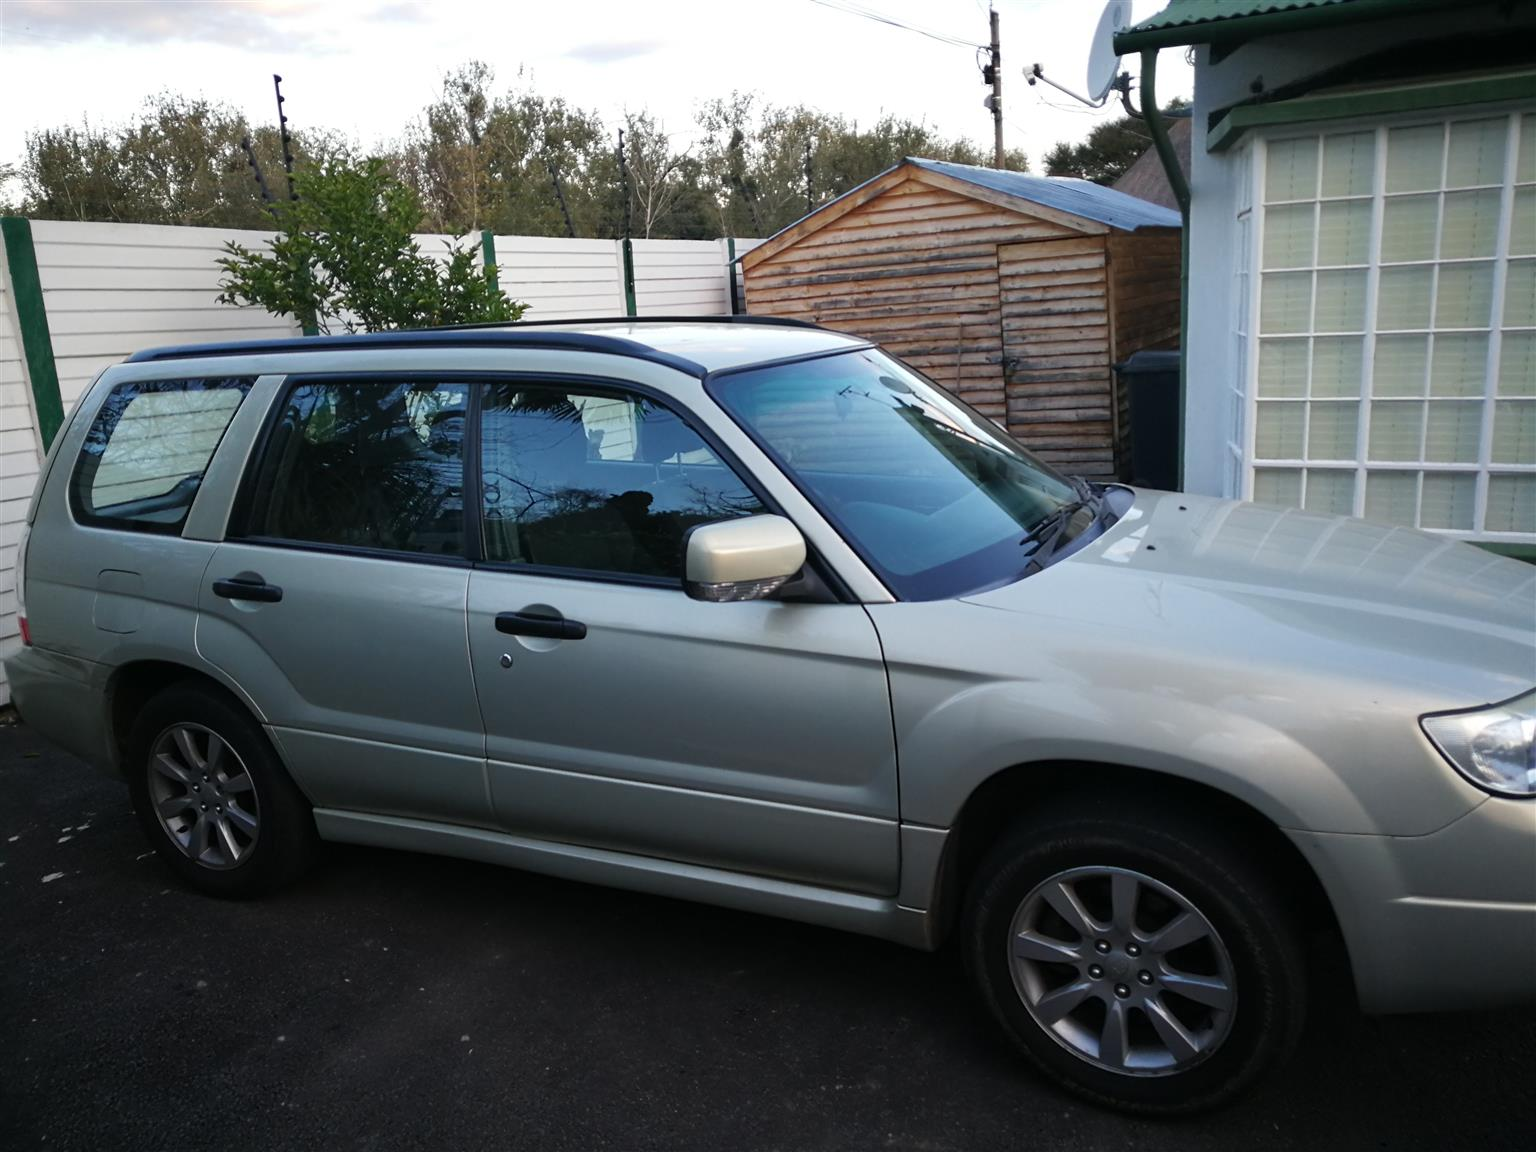 2006 Subaru Forester 2.5 XS